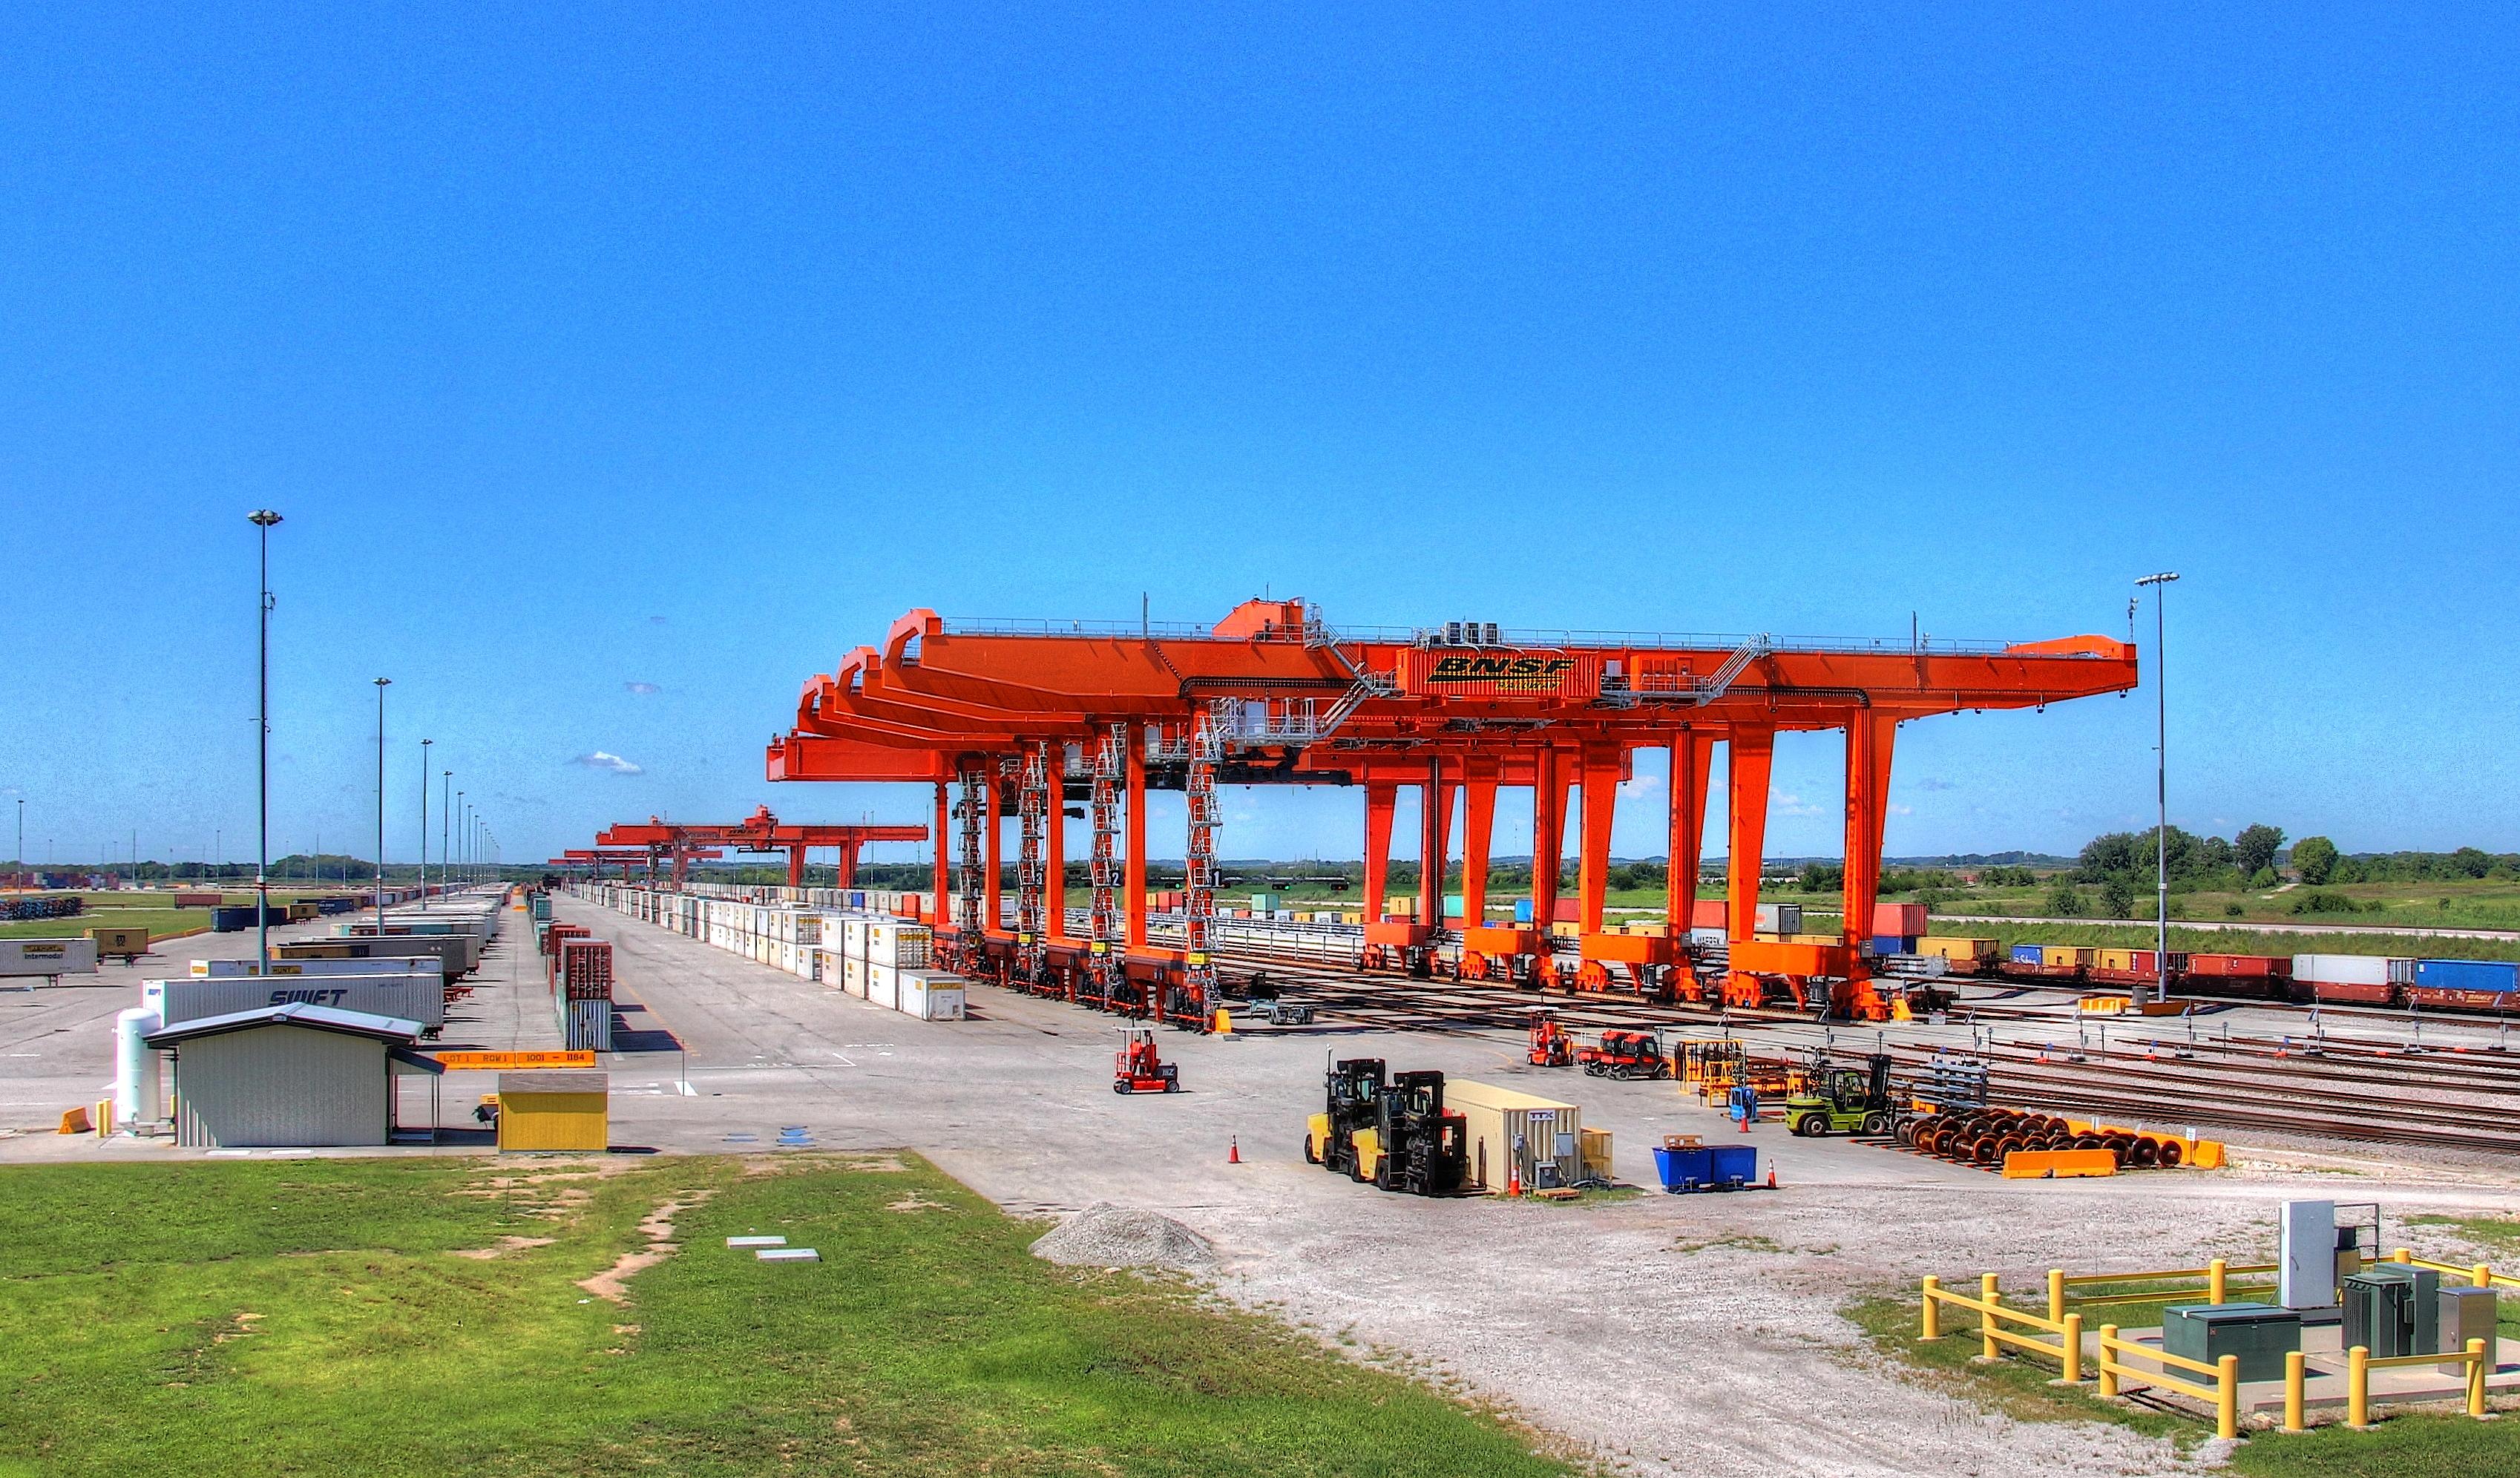 File:BNSF Logistics Park Kansas City Intermodal Facility